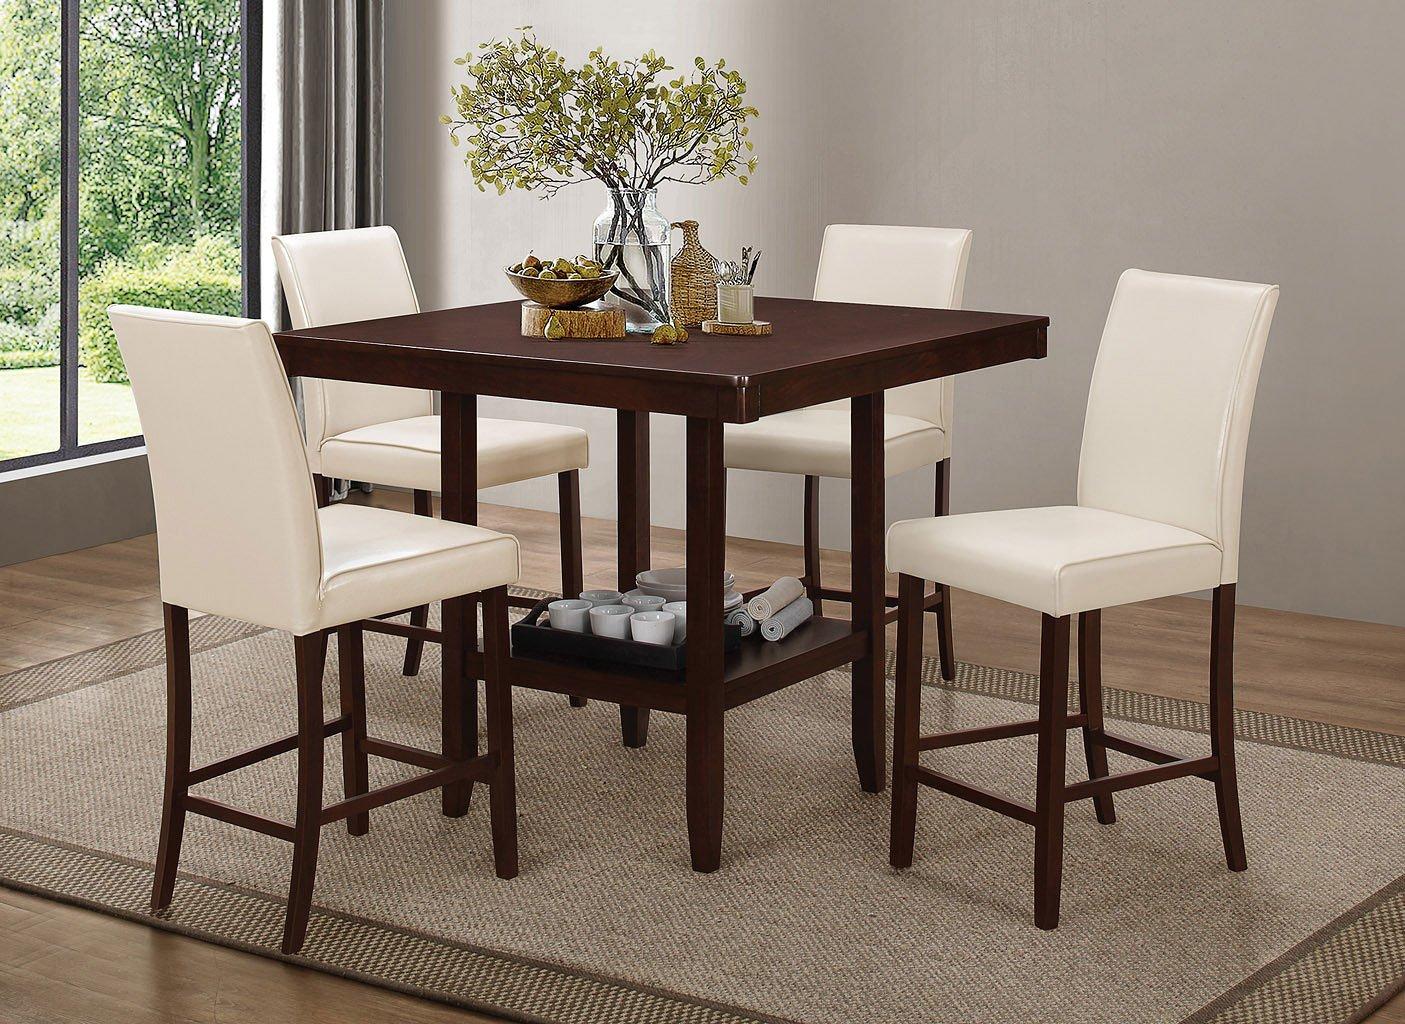 Fattori Counter Height Dining Set W/ Cream Chairs